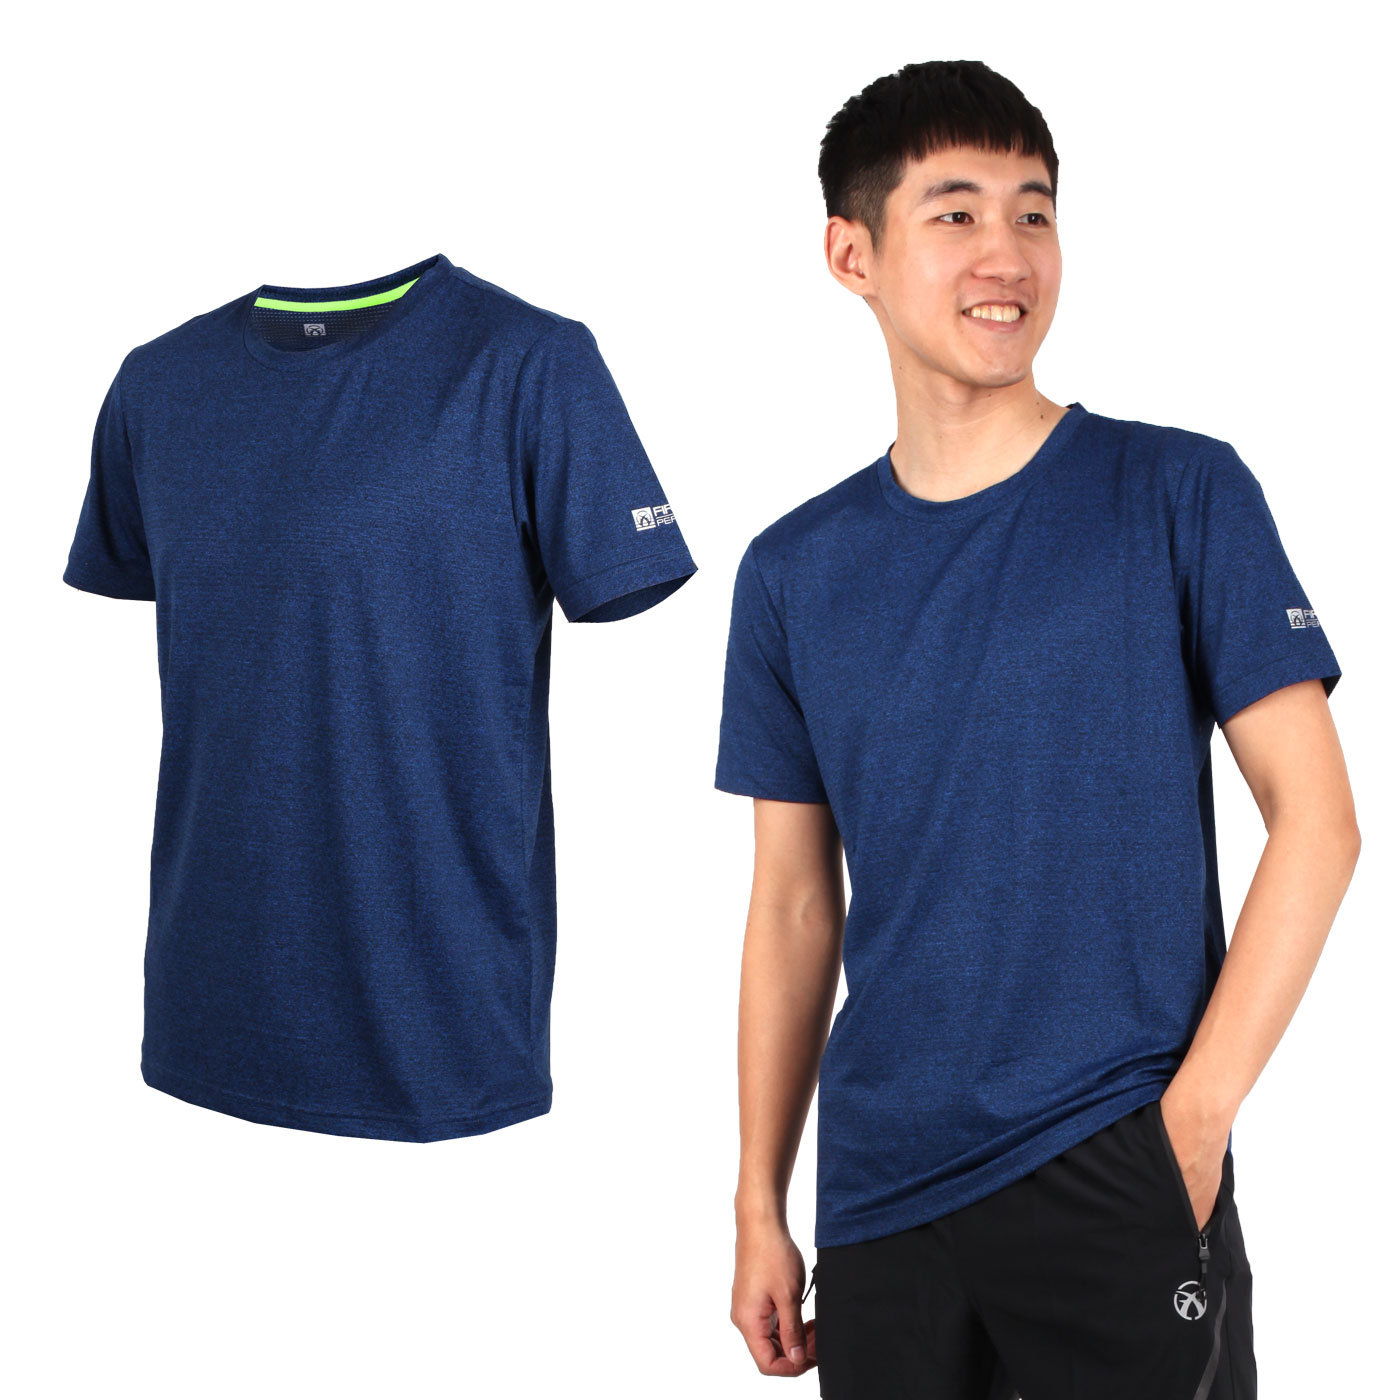 FIRESTAR 男彈性短袖圓領T恤 D9232-18 - 麻花深藍黑